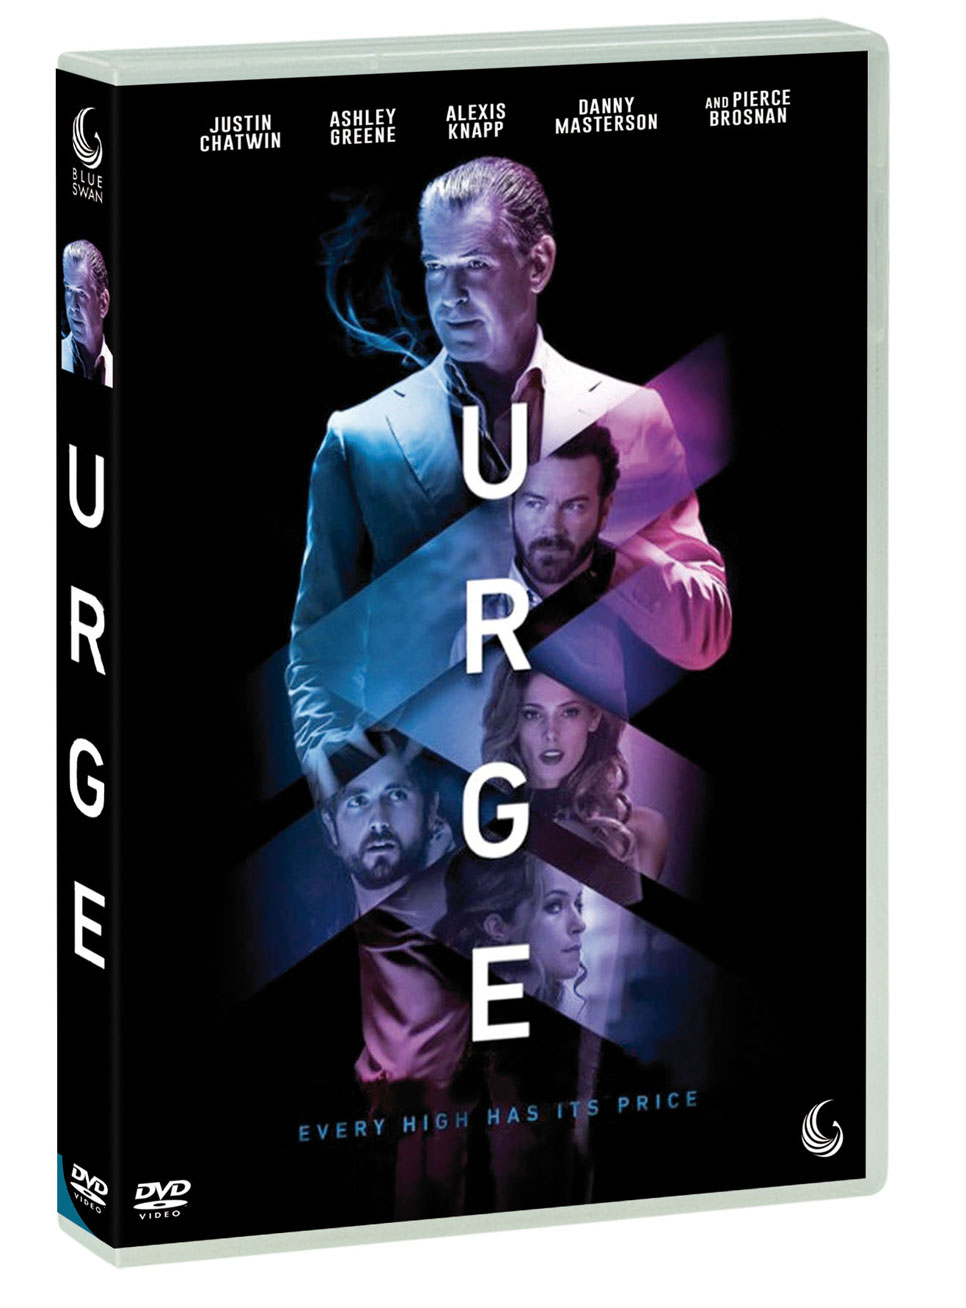 URGE (DVD)